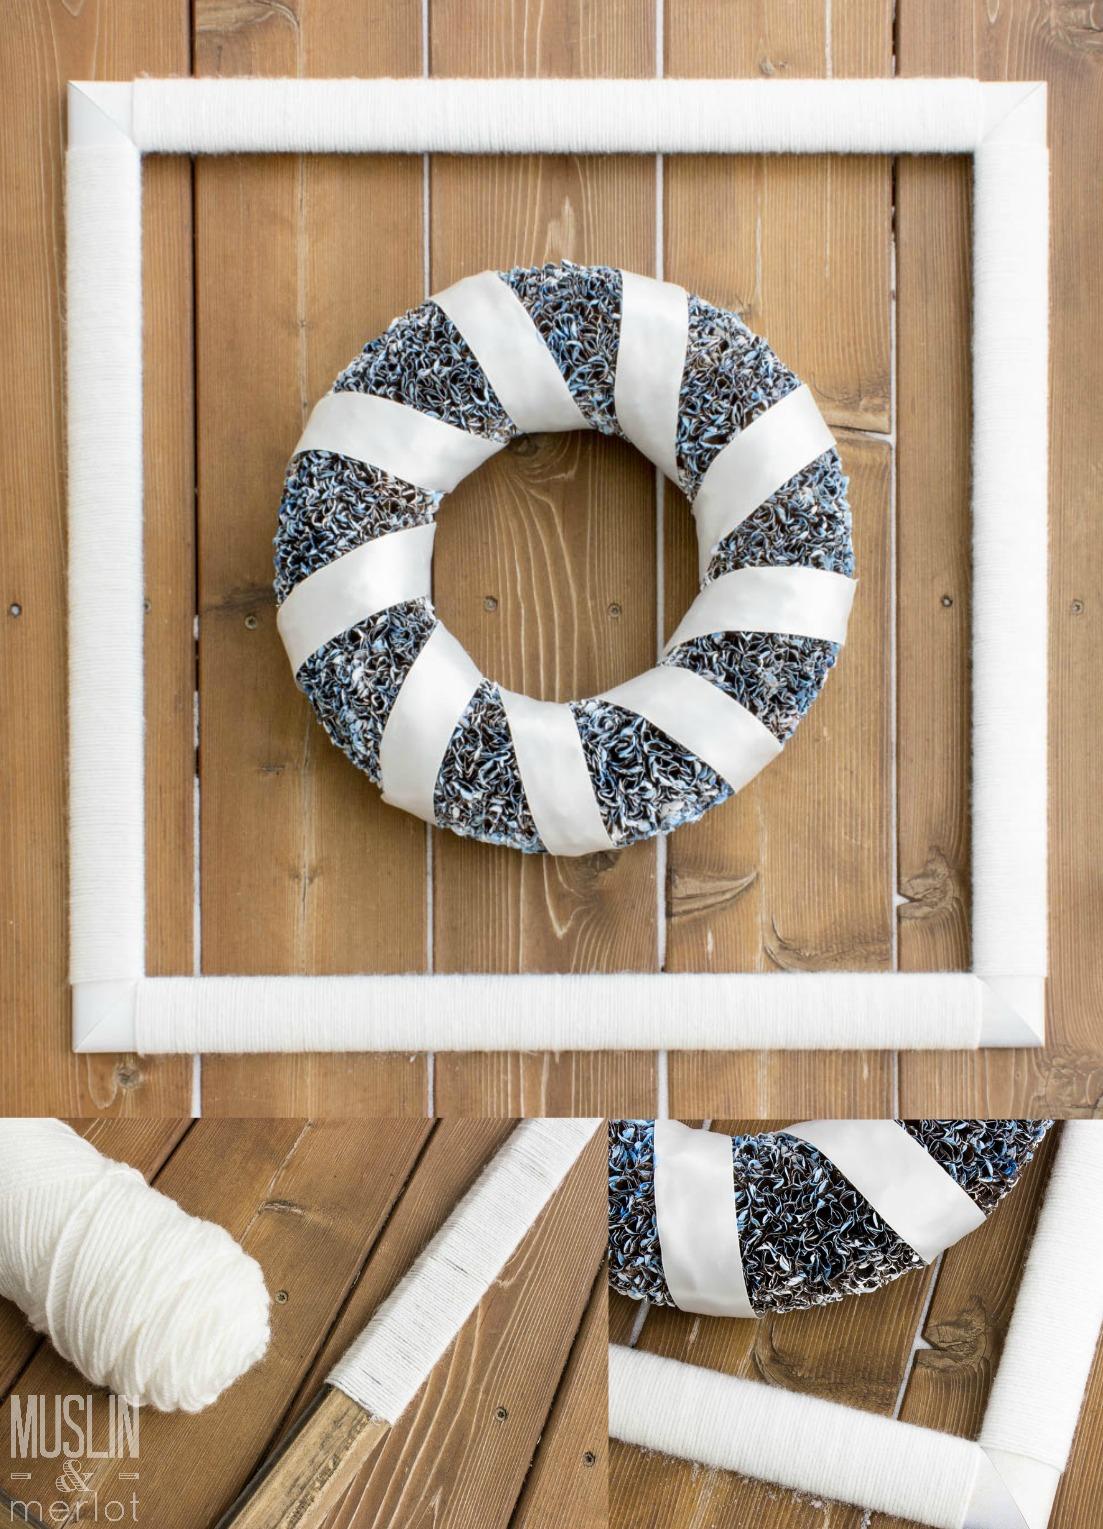 Yarn Wrapped Frame Muslin And Merlot